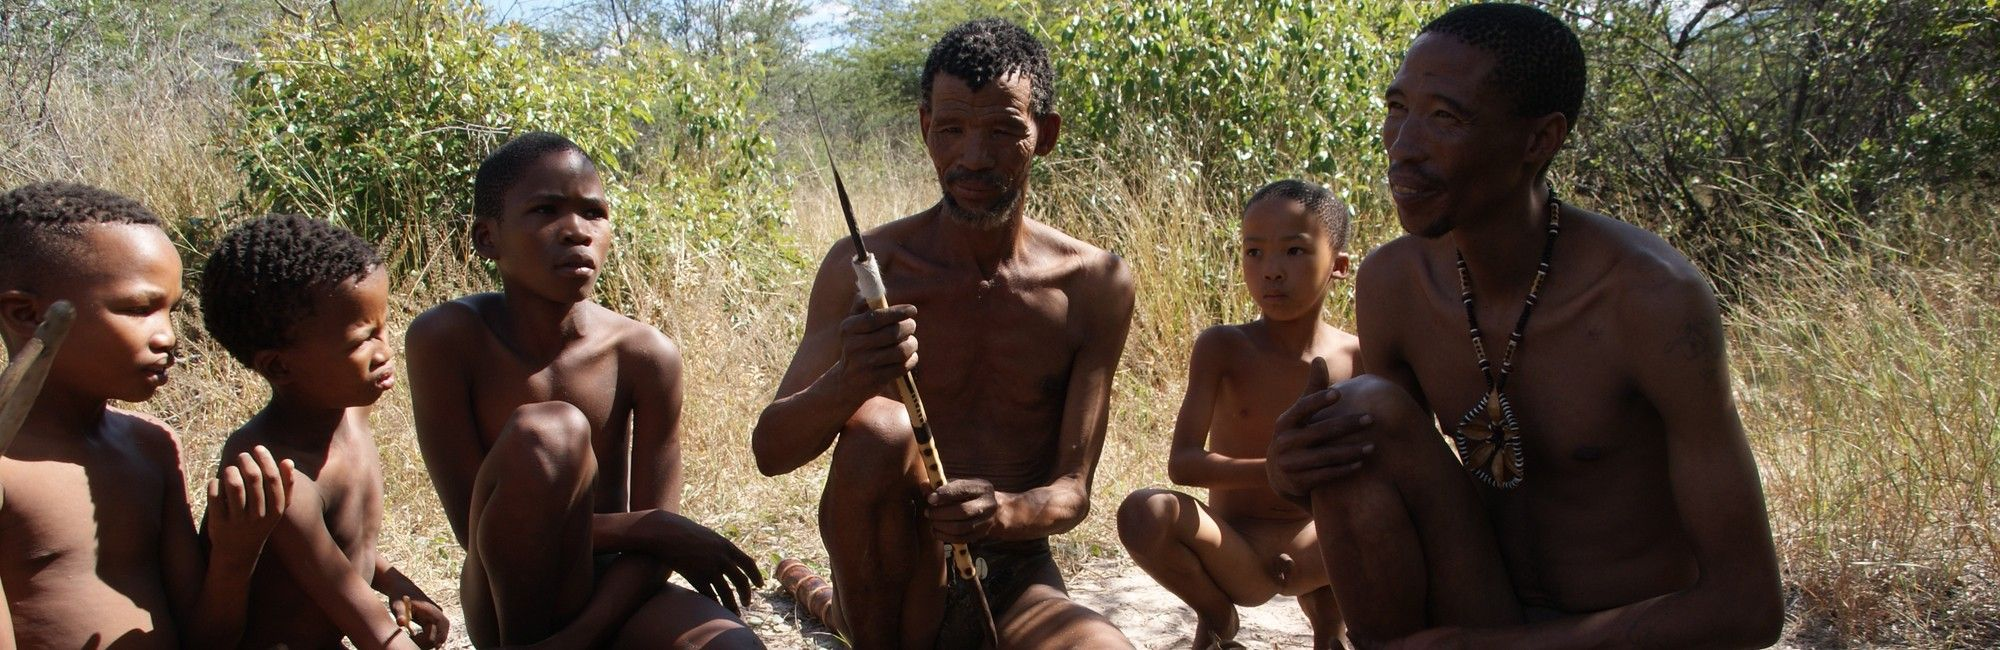 Bushmanland